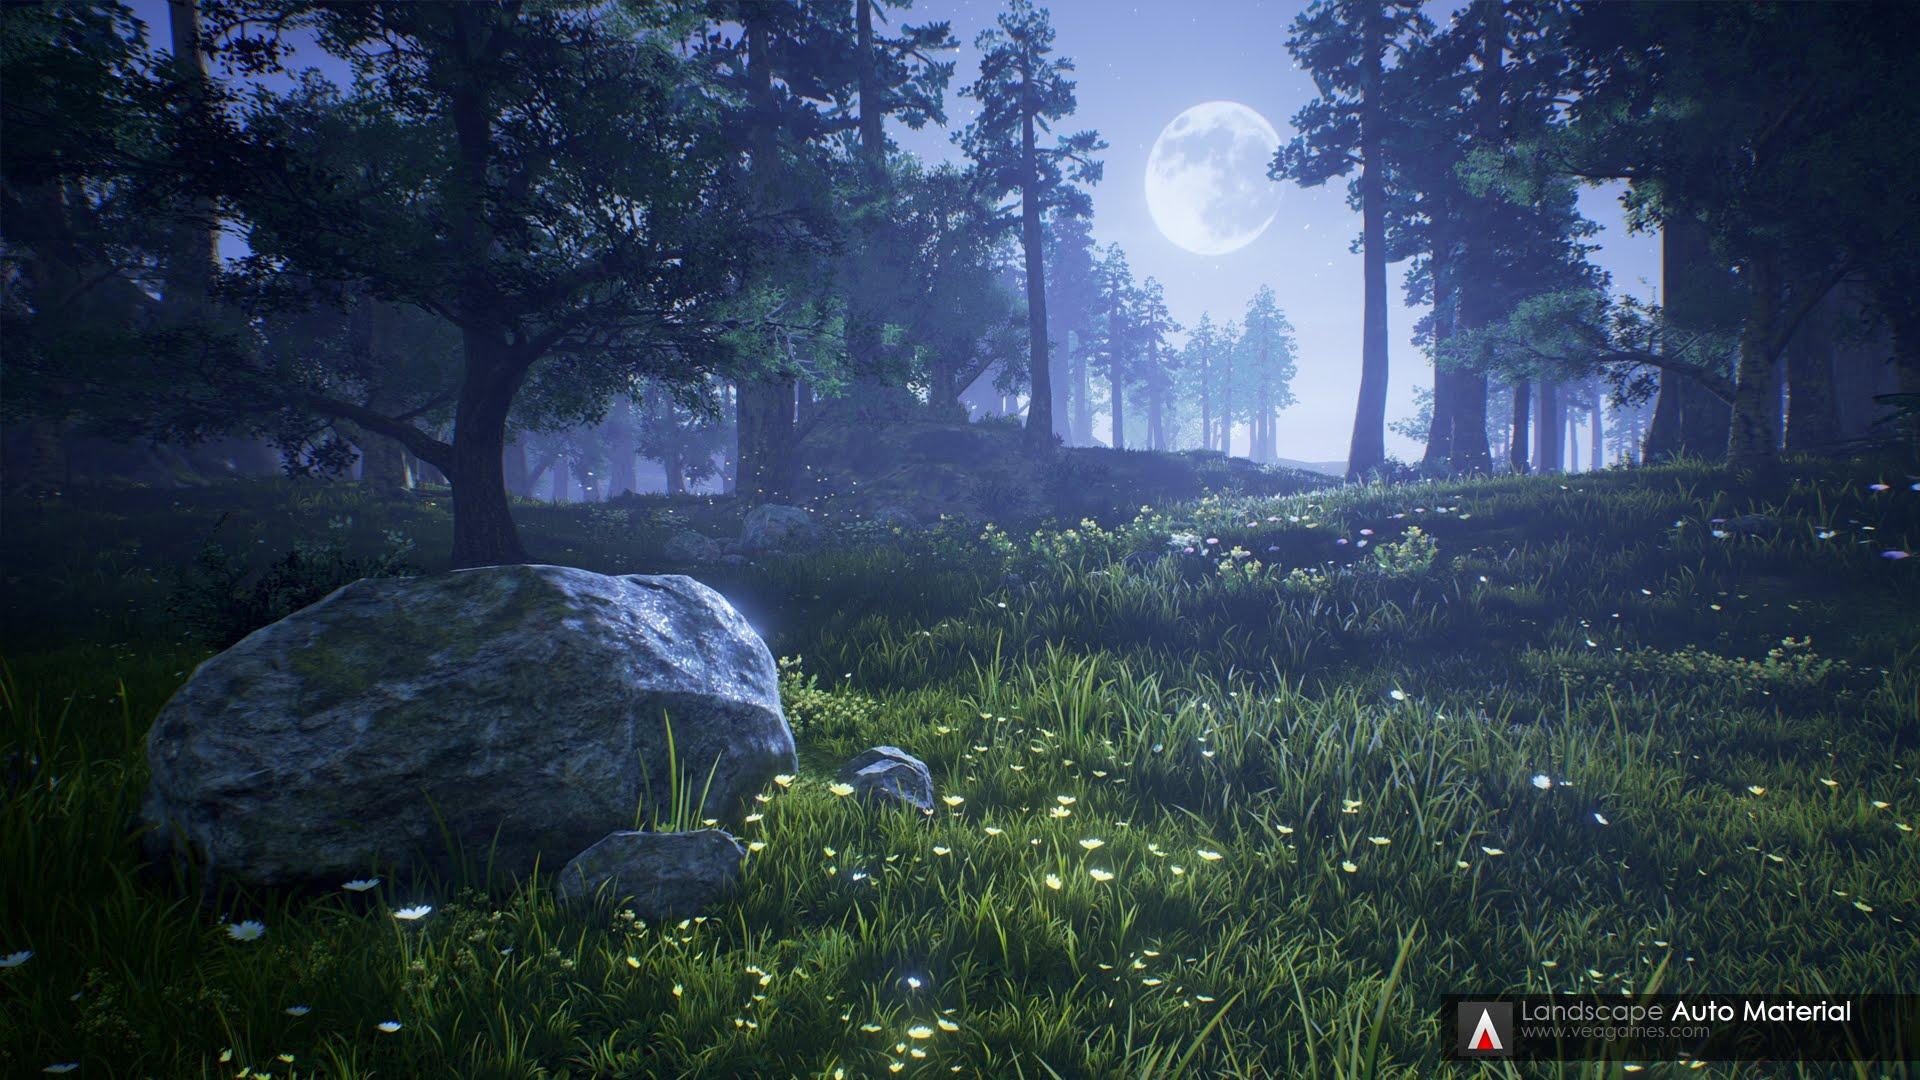 Landscape Auto Material - Unreal Engine 4